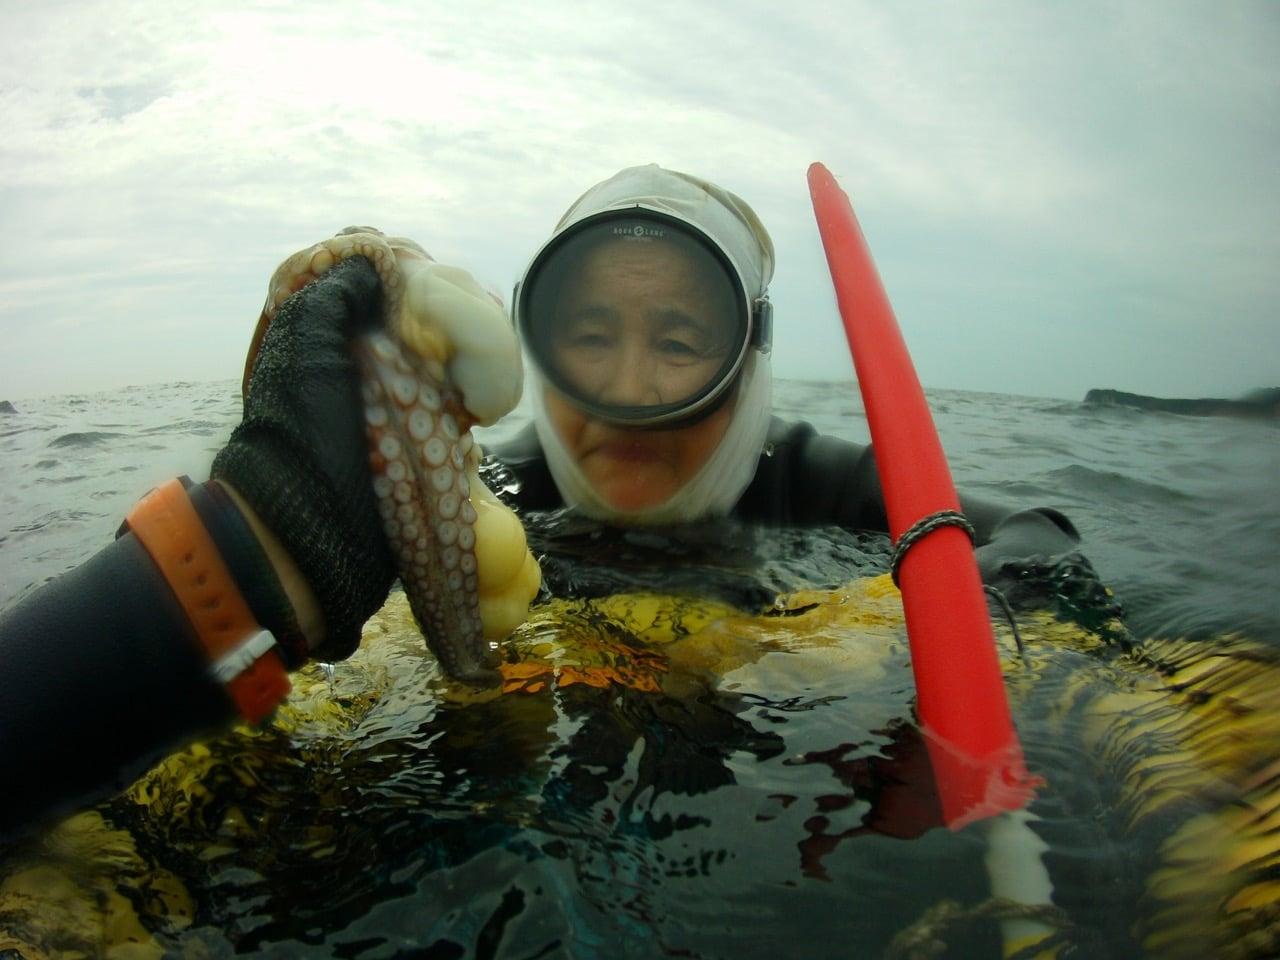 Sayuri shows me the tako (octopus) she caught.